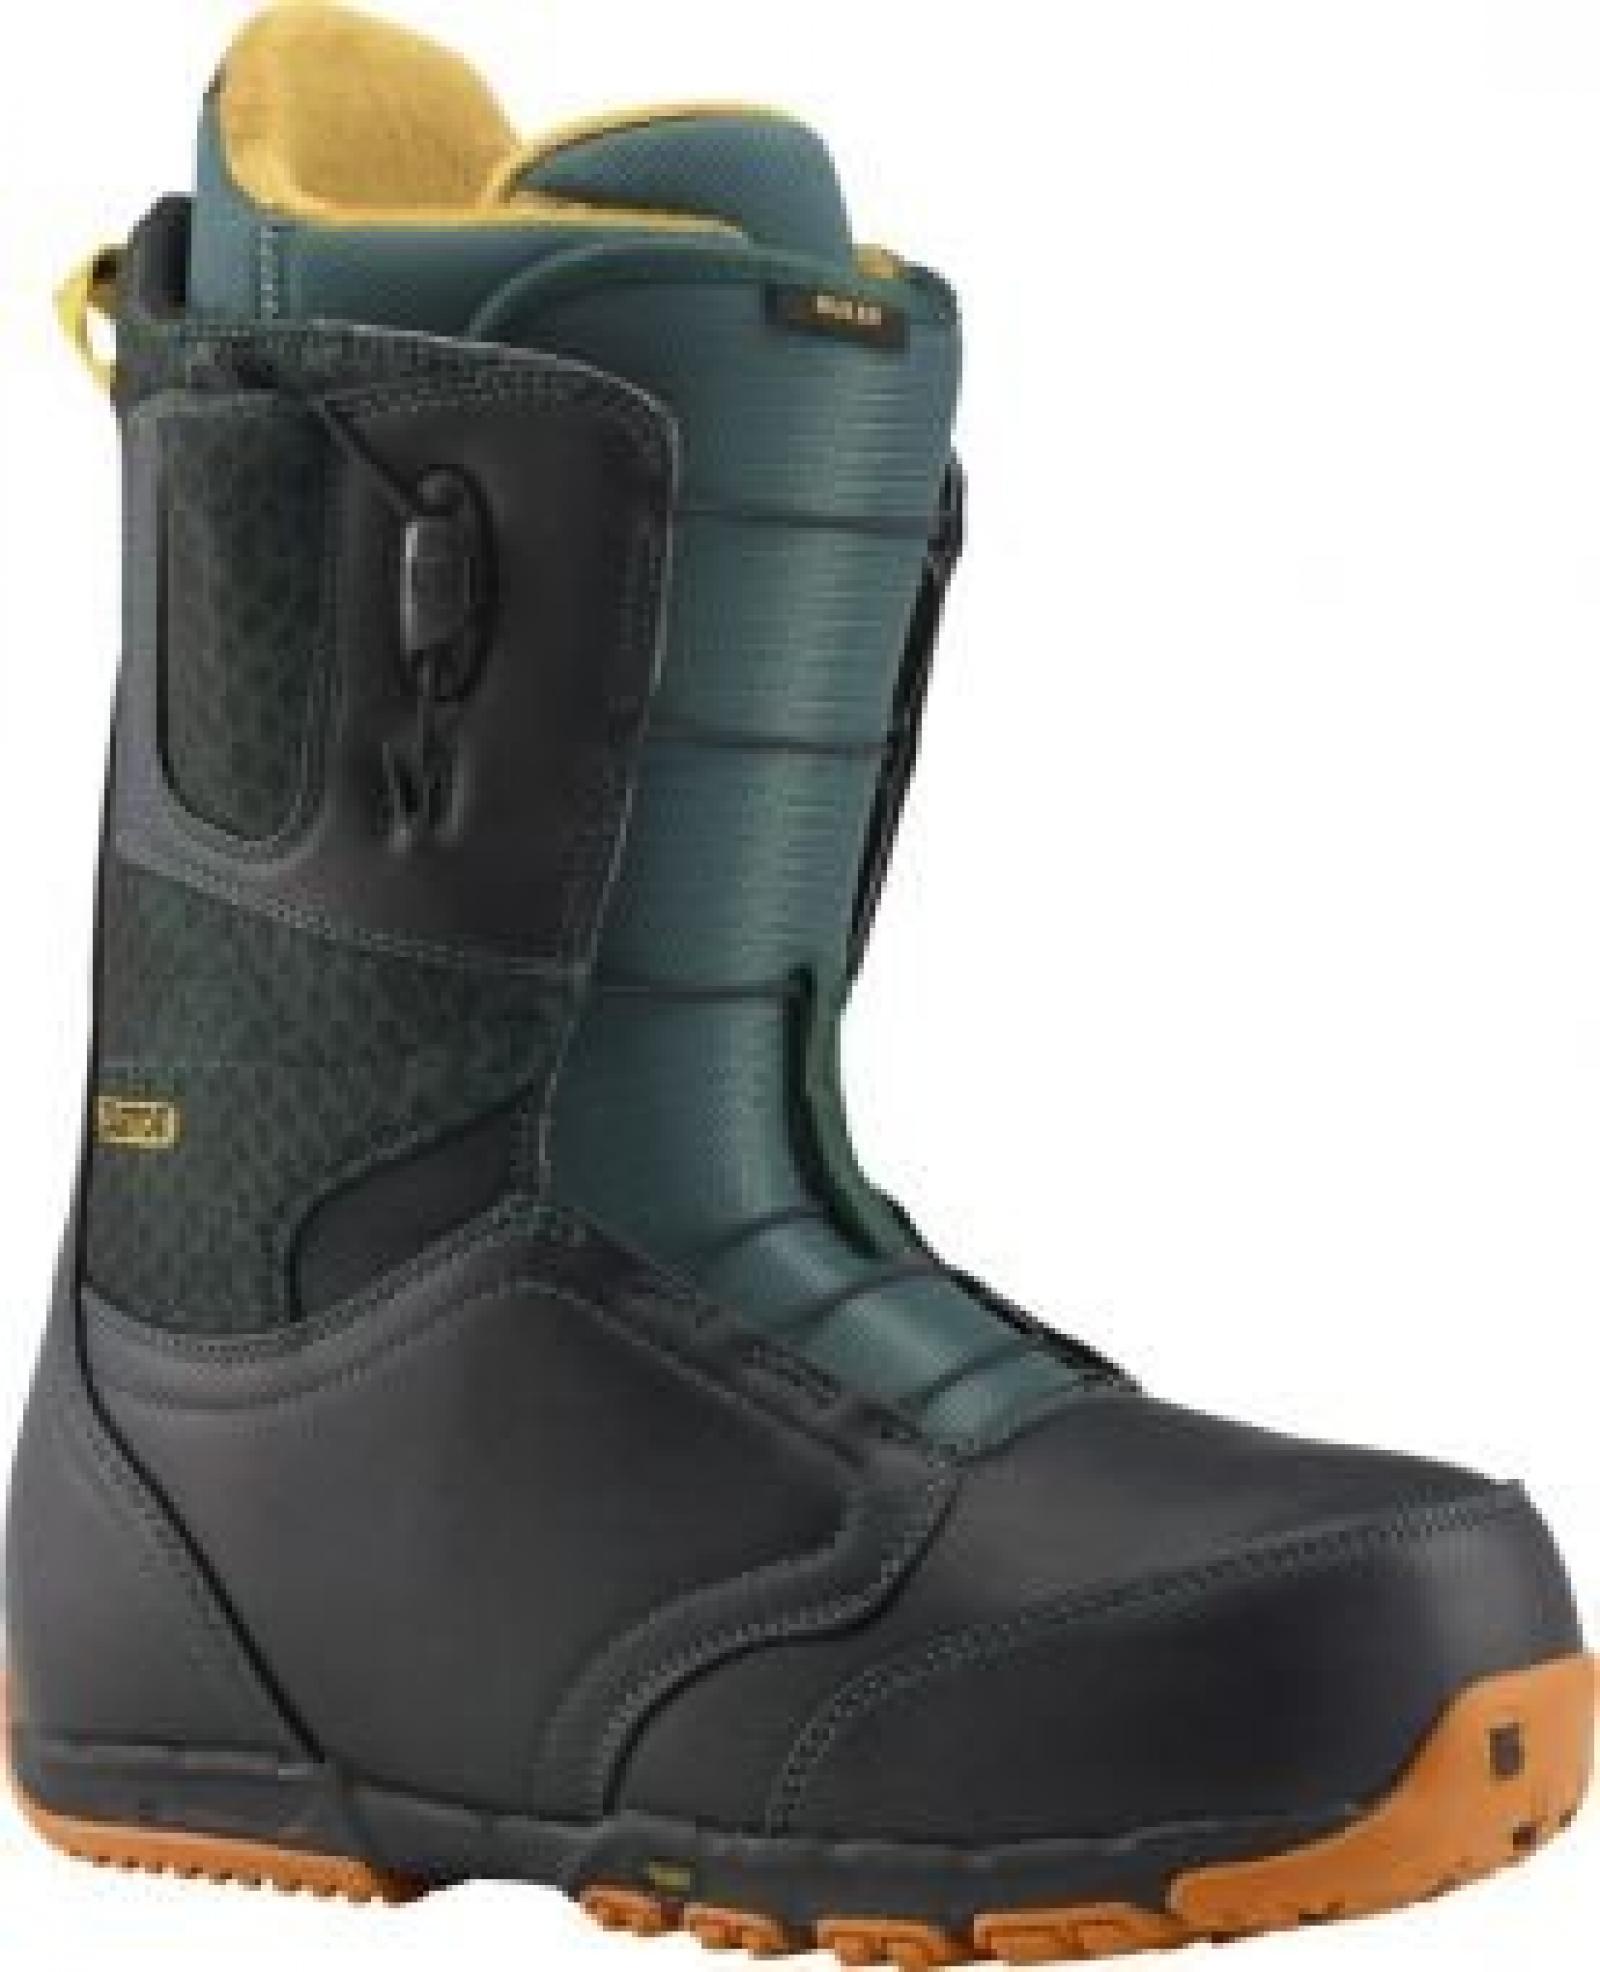 BURTON RULER Boot 2015 black/green